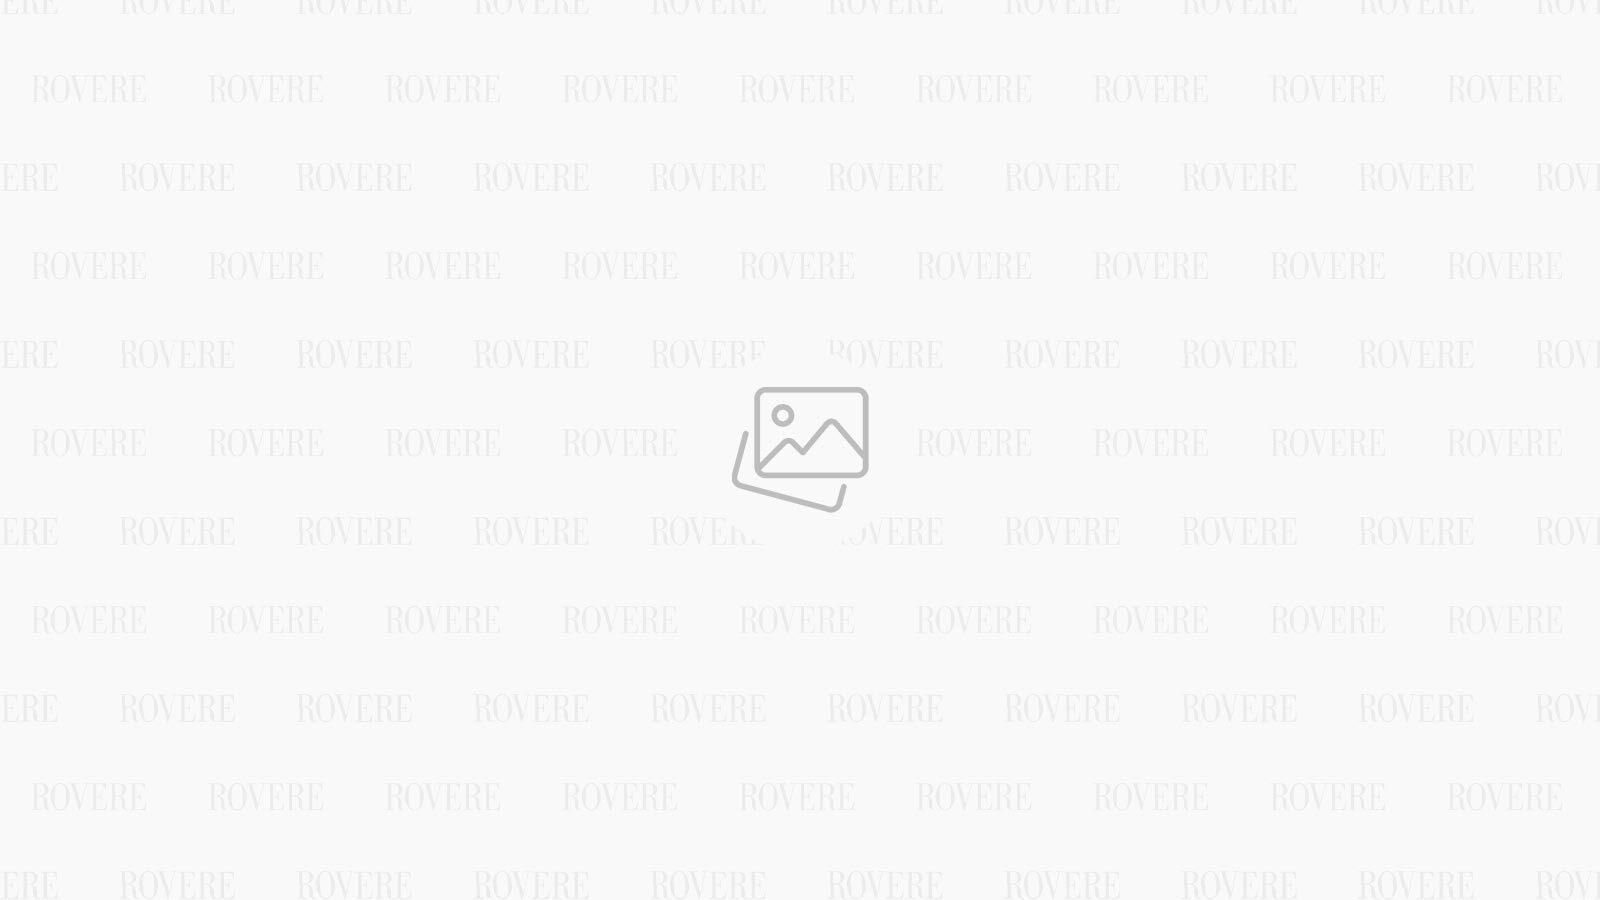 Canapea Liniara Primo 3 Locuri Maxi + Pat 160X190 Textil, Culoare Amore 41 Navy